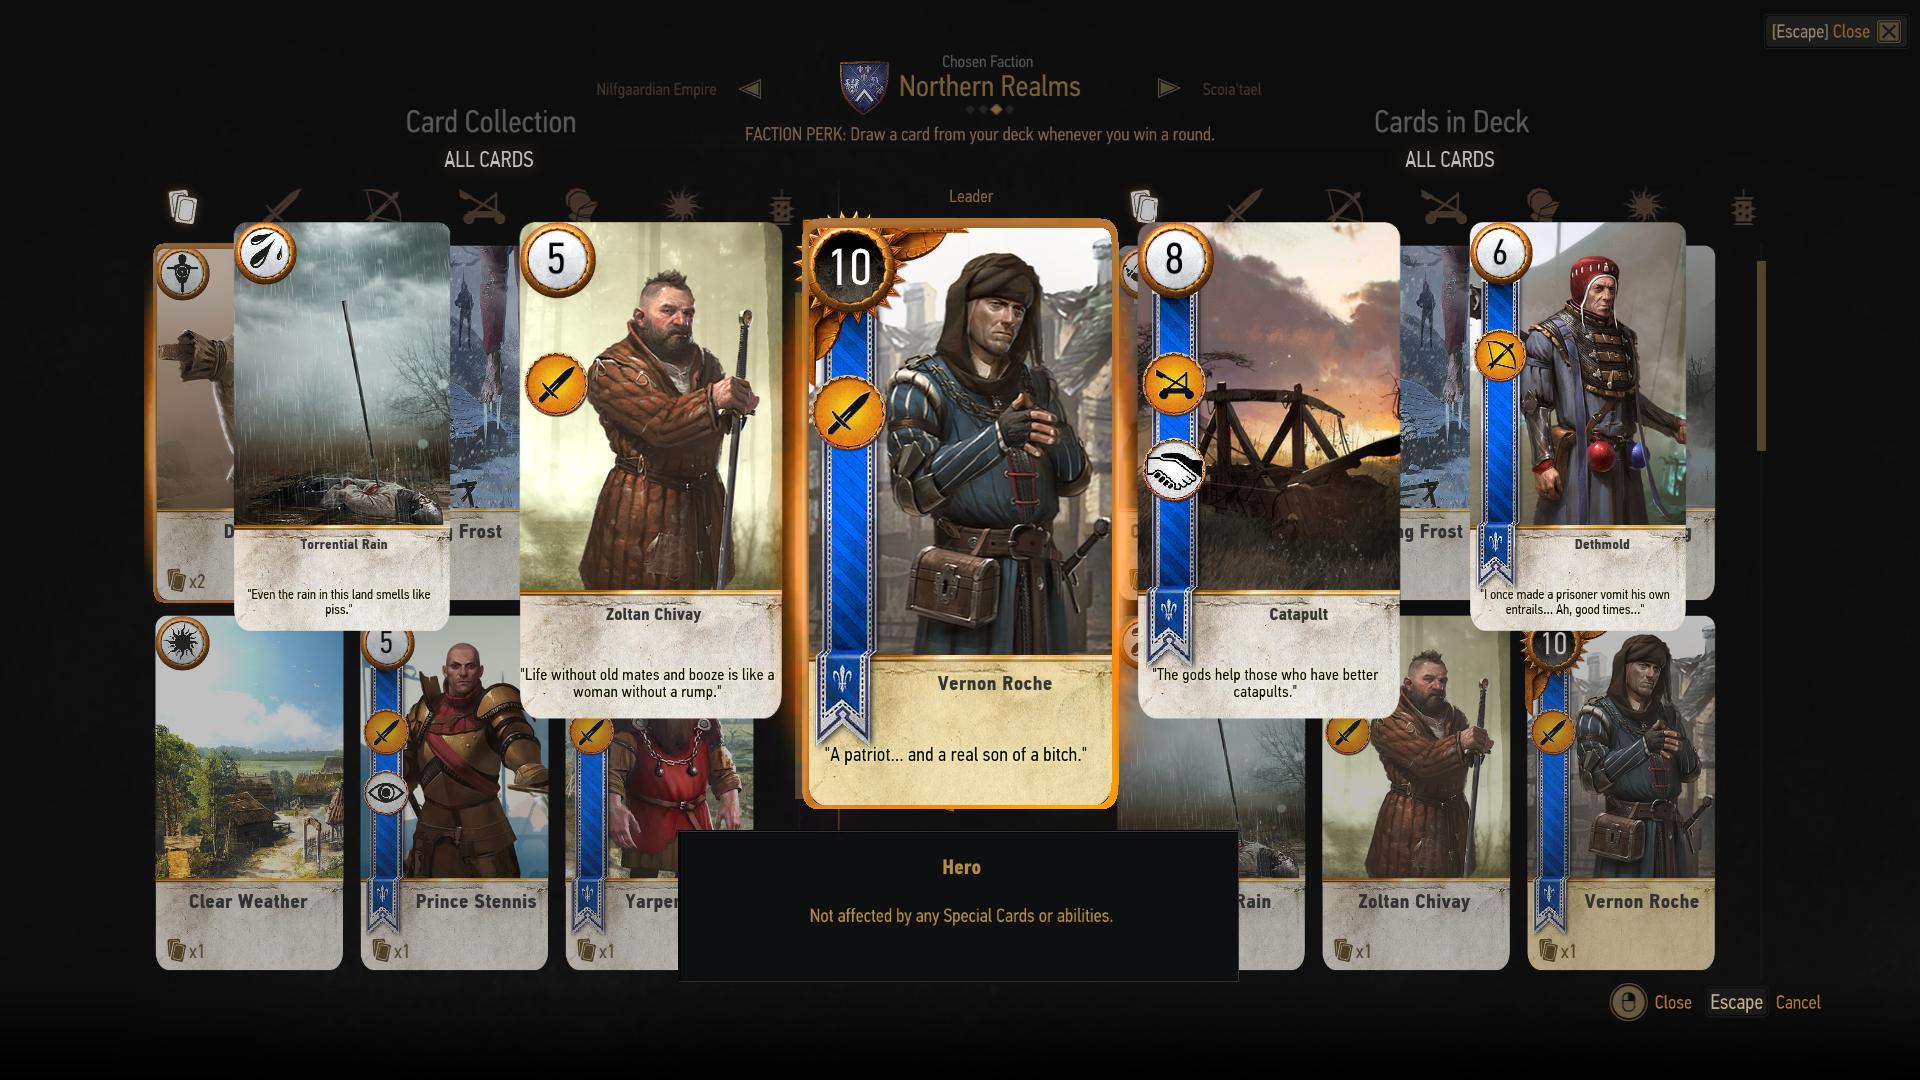 gwent giocatori di velen  witcher wiki ufficiale